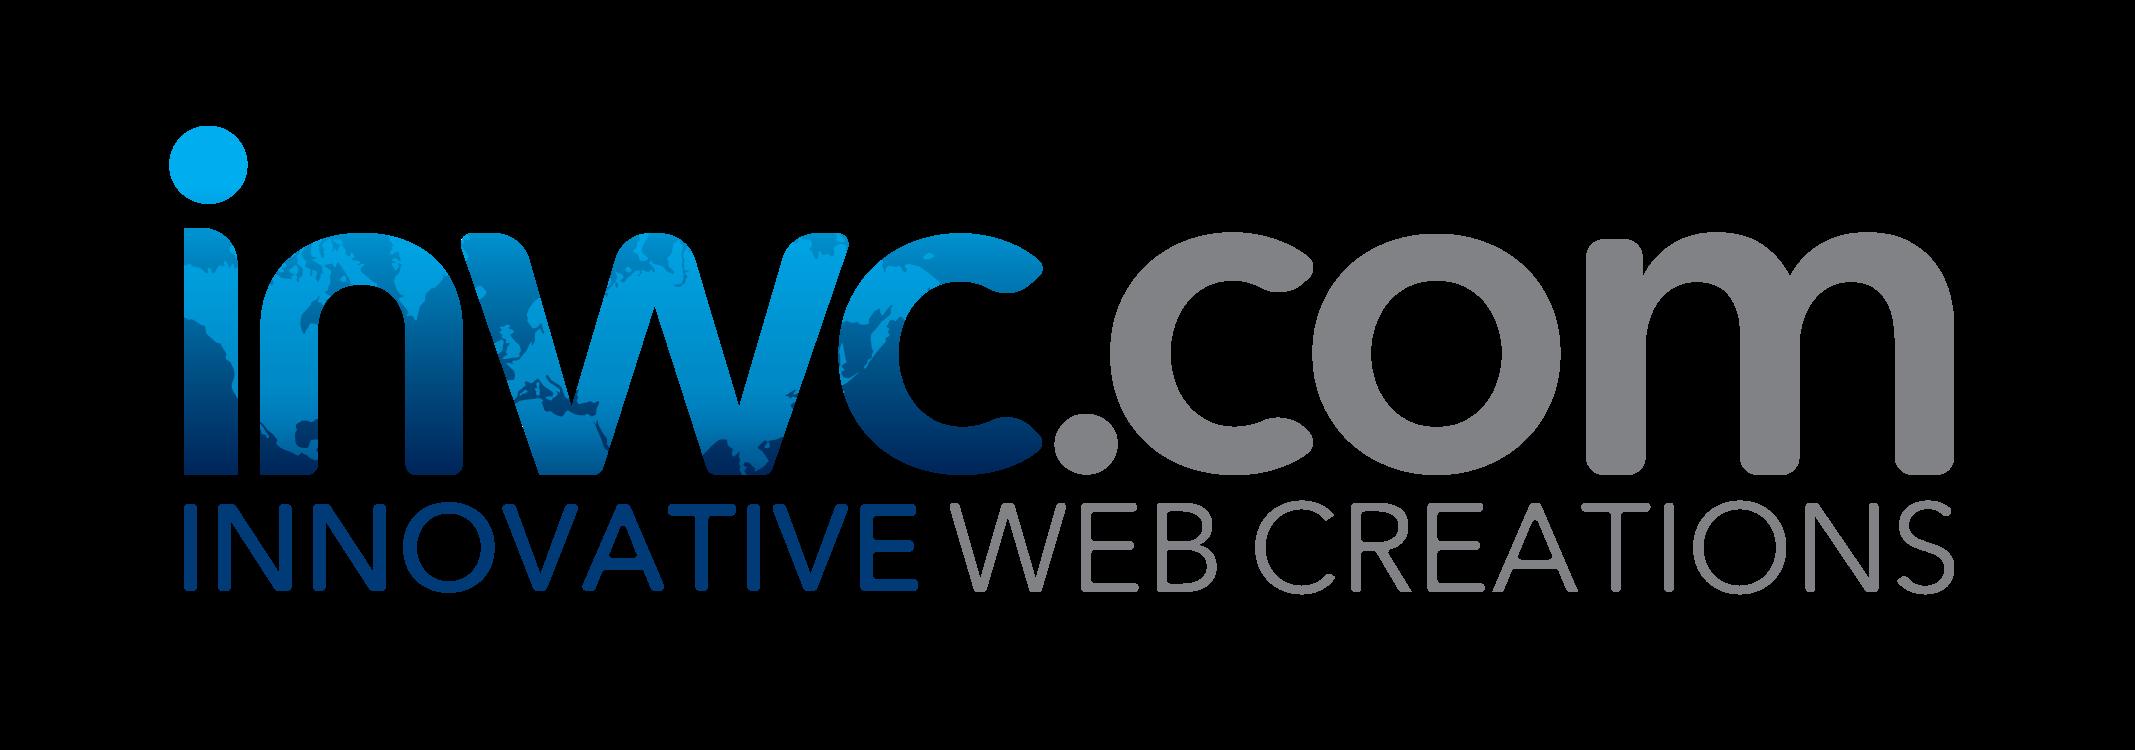 Innovative Web Creations